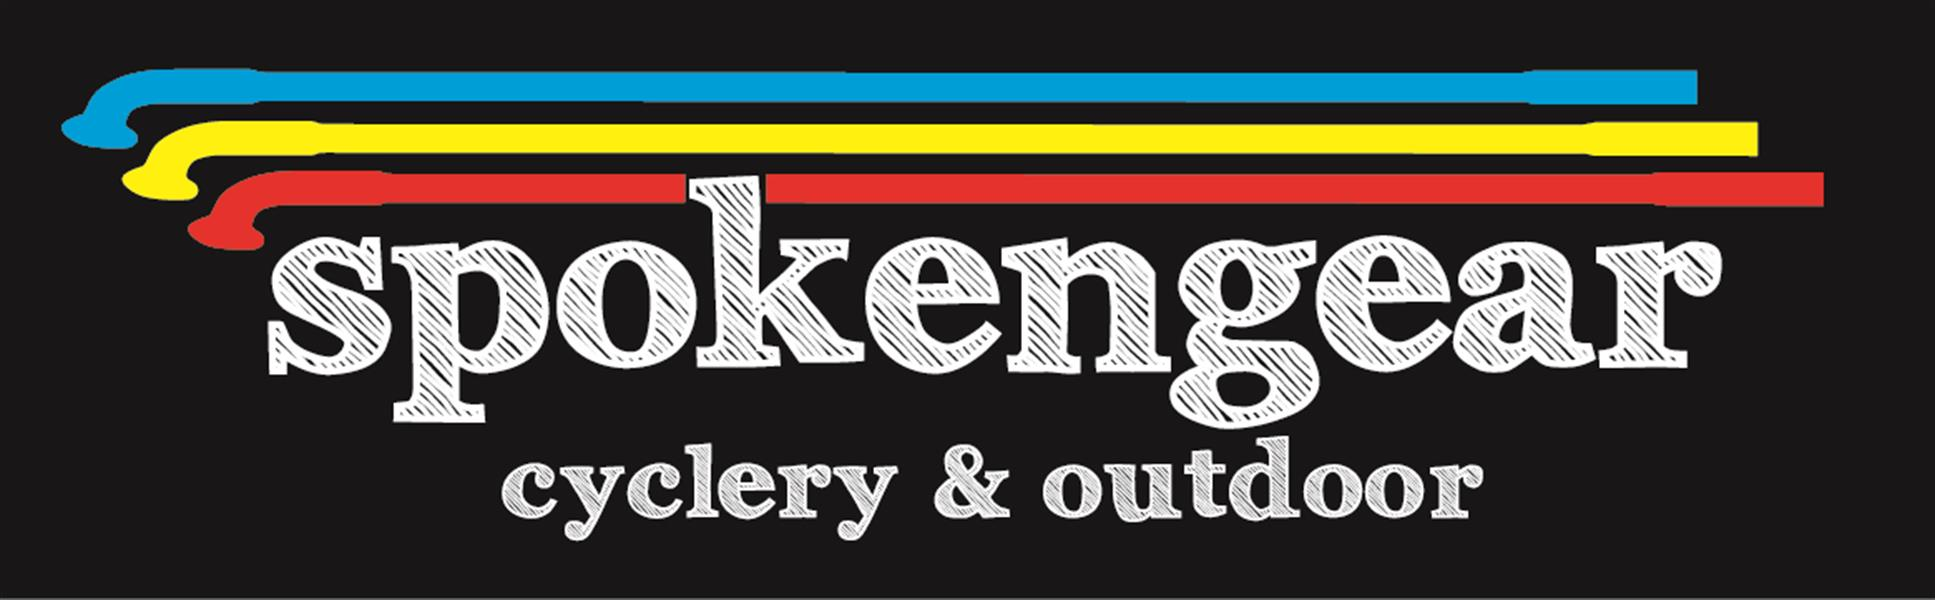 Spokengear Cyclery & Outdoor